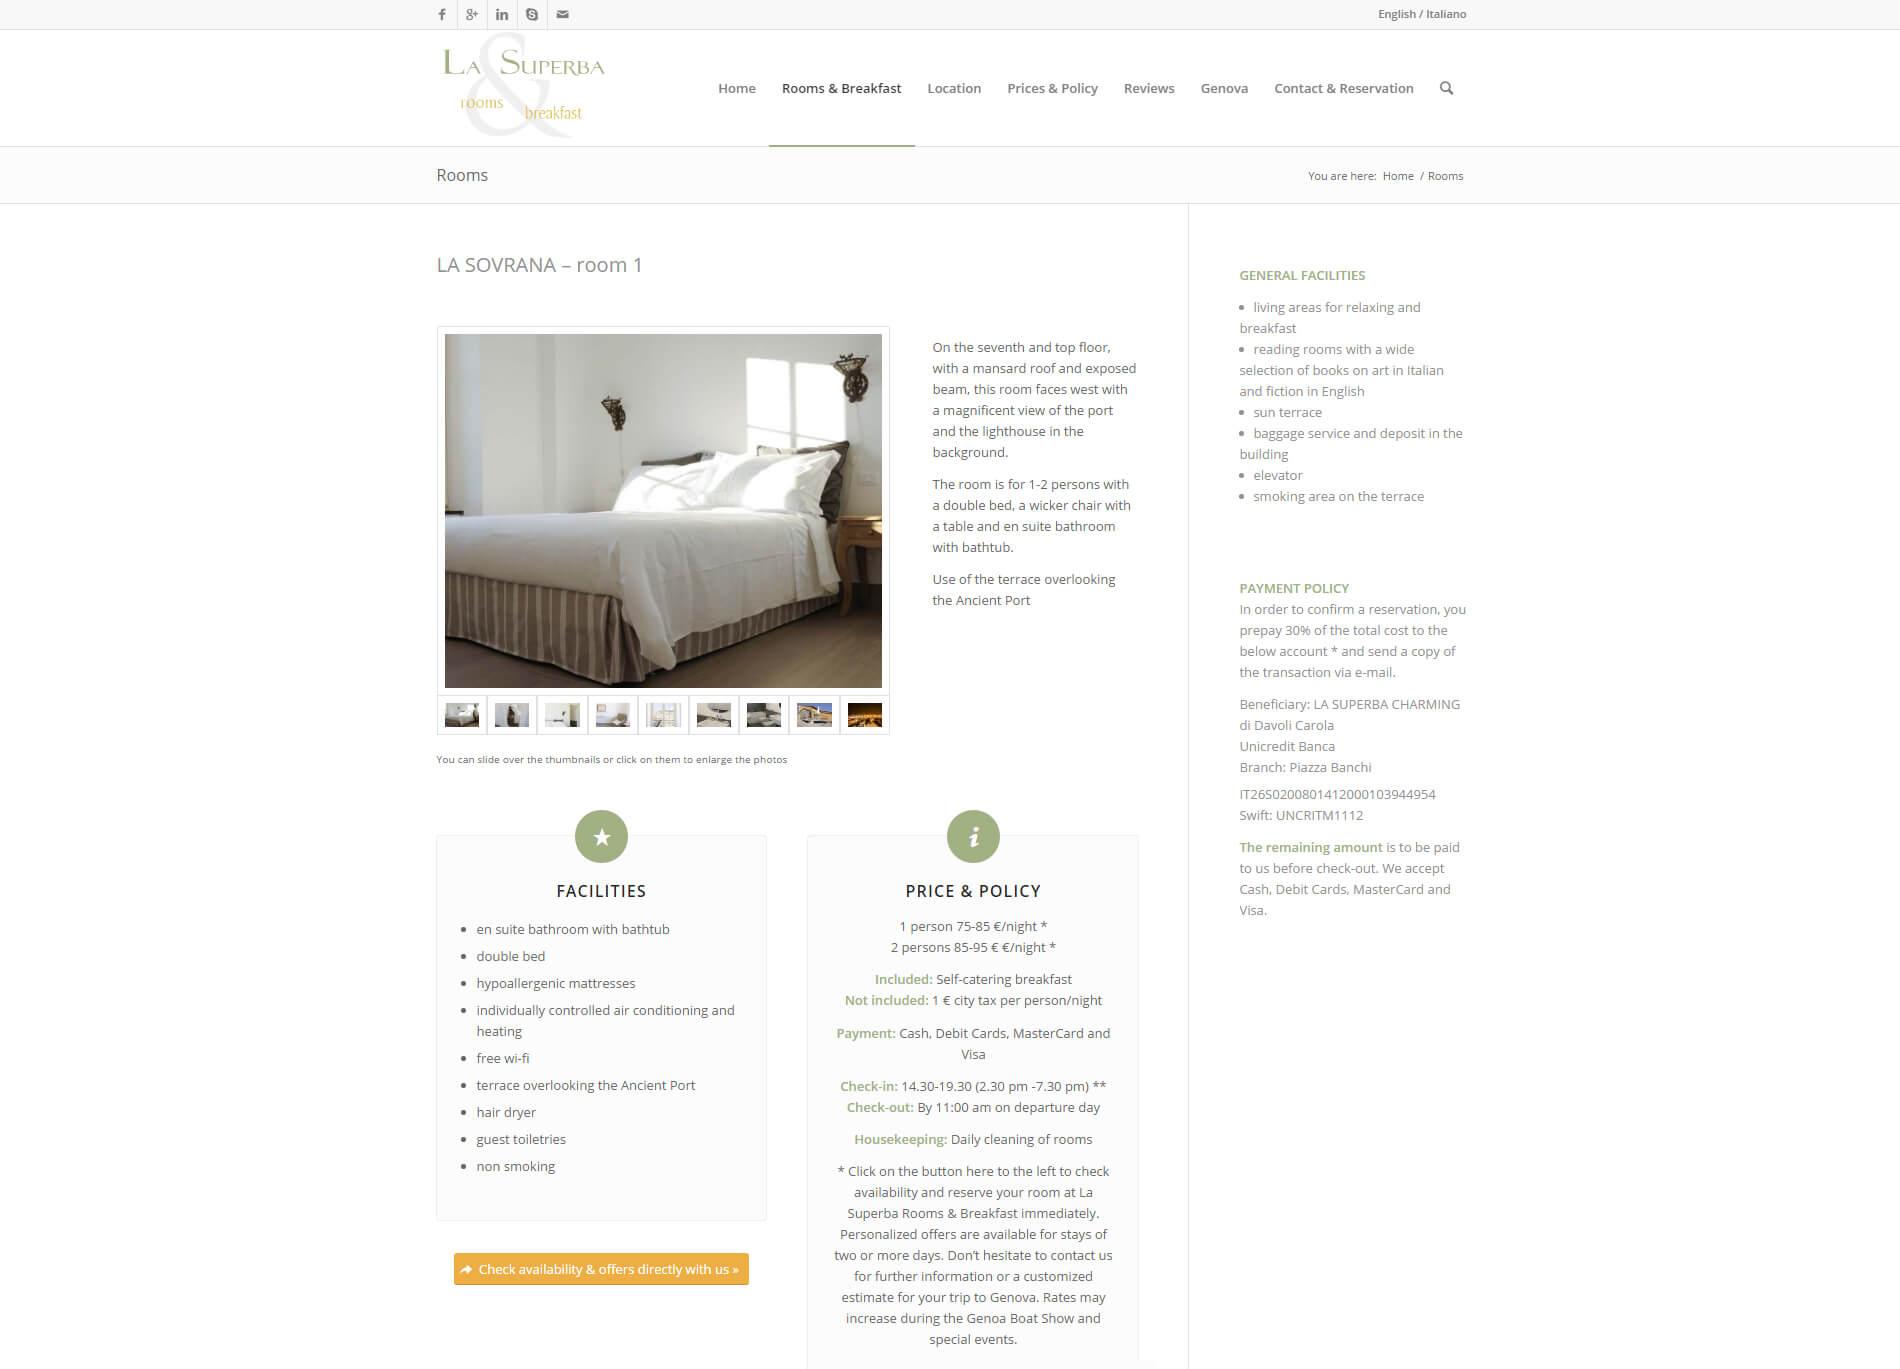 Web design anweb La Superba B&B Genua Italy